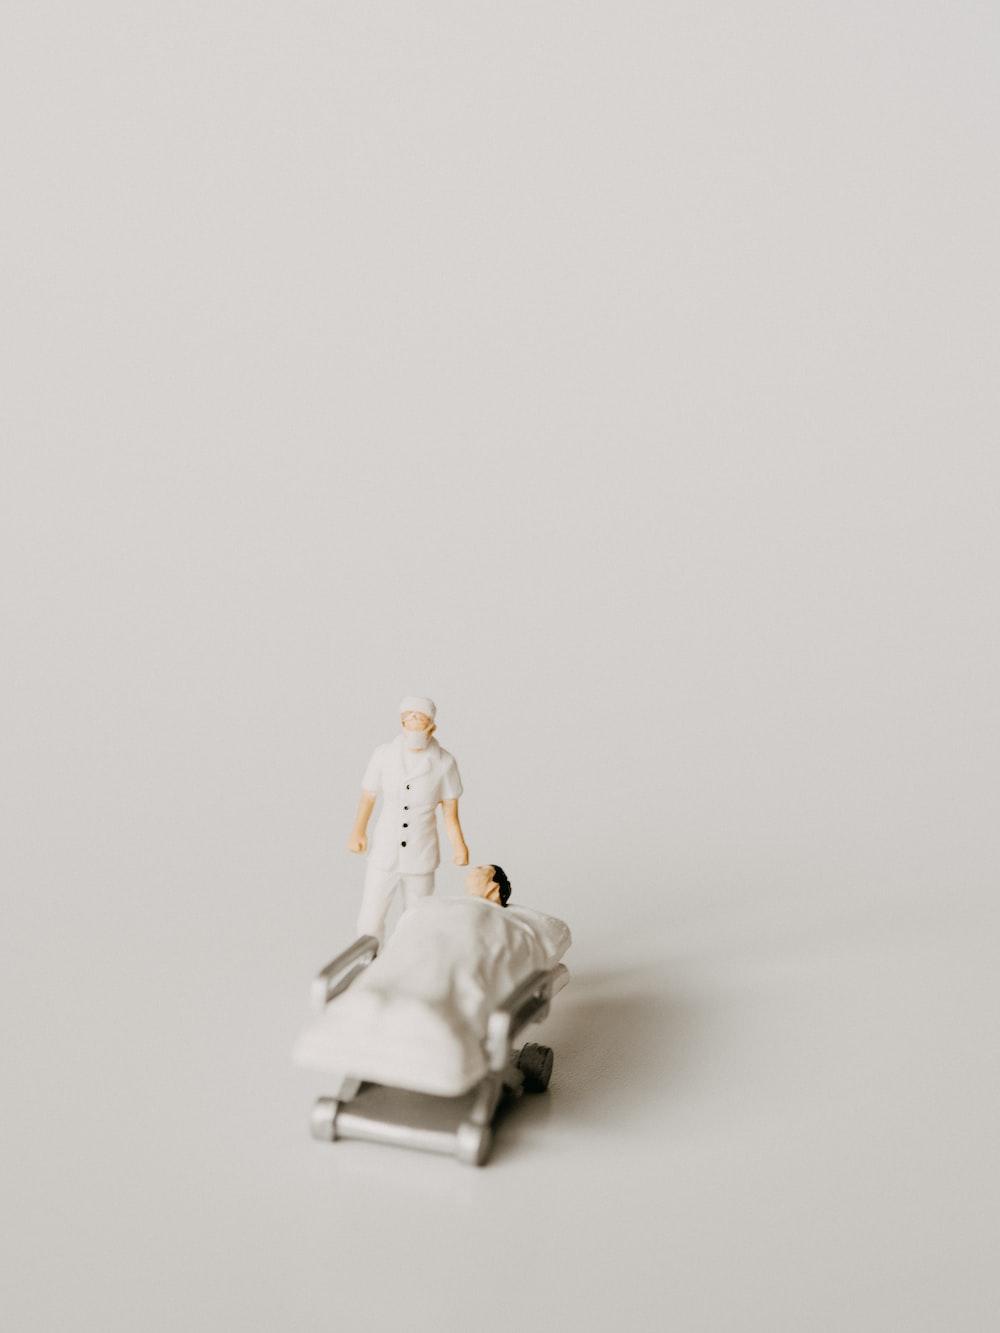 white ceramic figurine on white surface